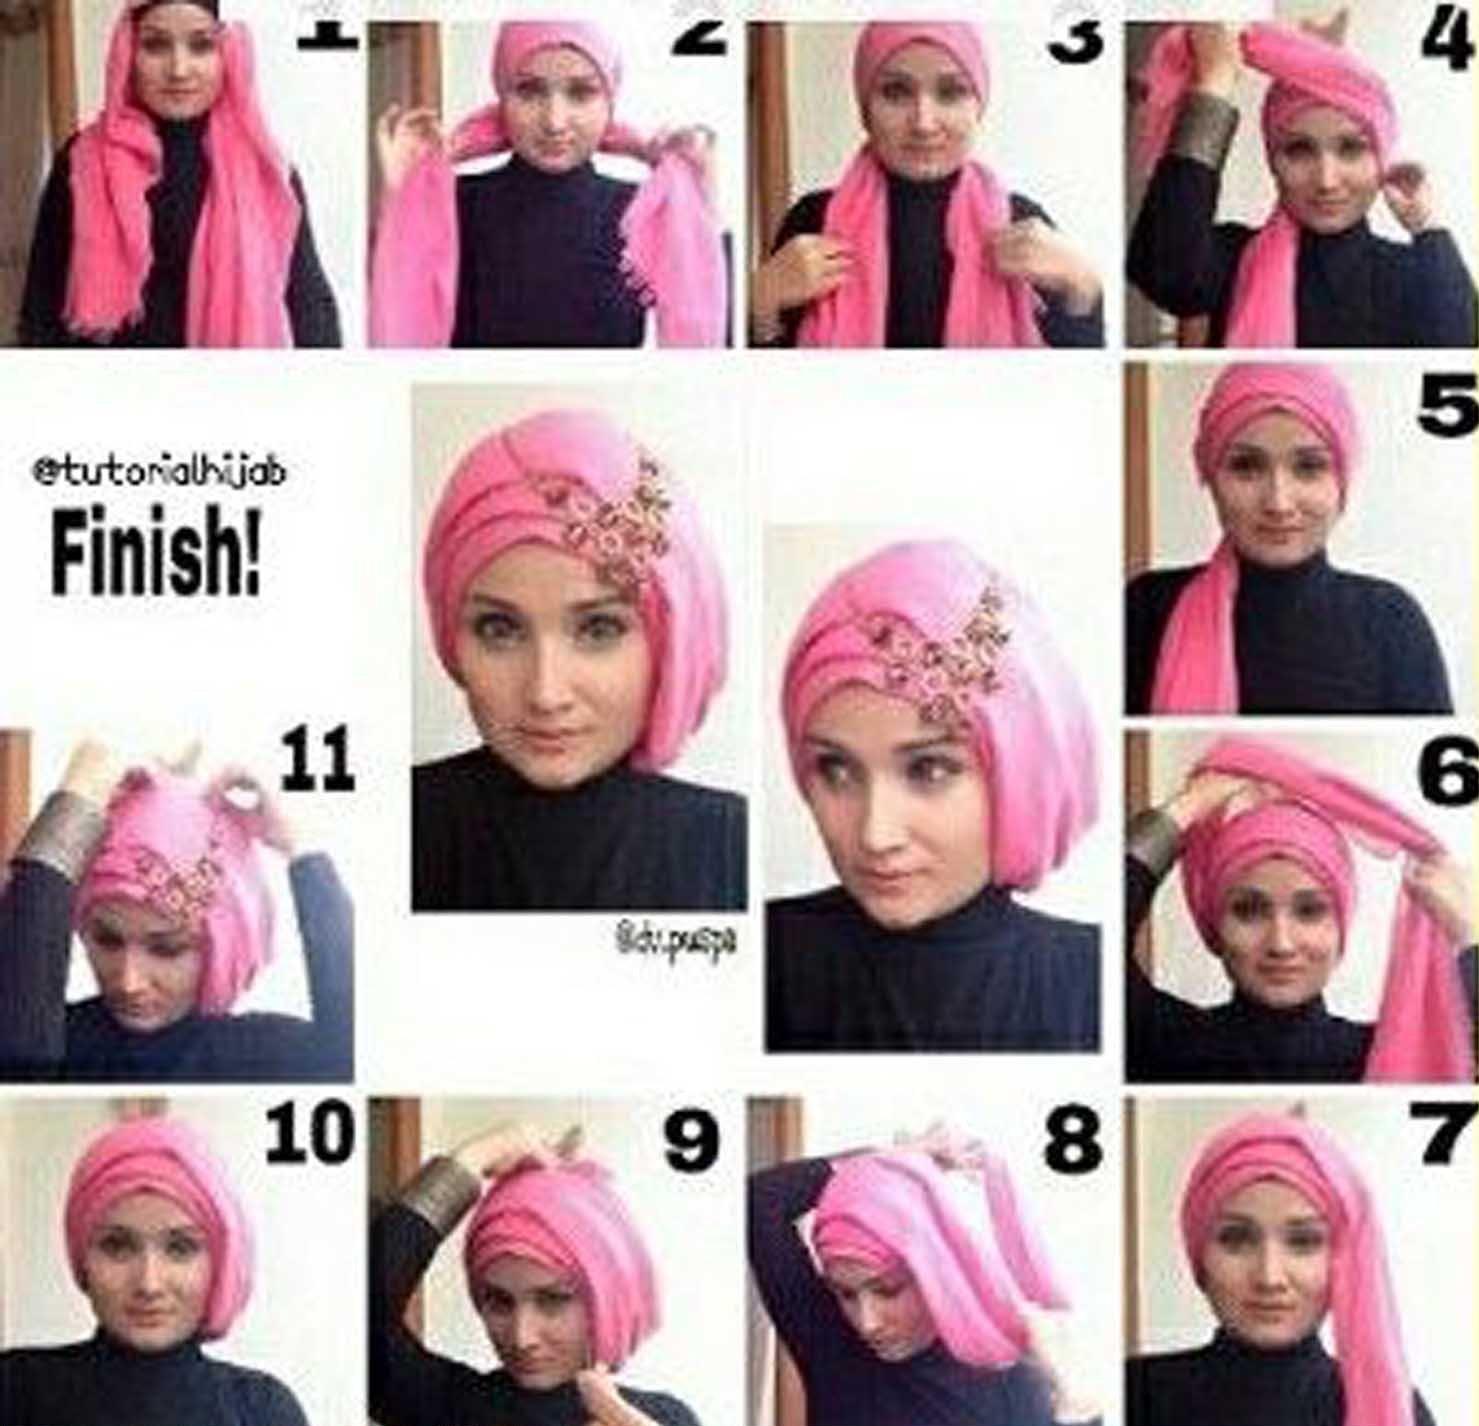 Tutorial Hijab Pashmina Turki Sejutahijab